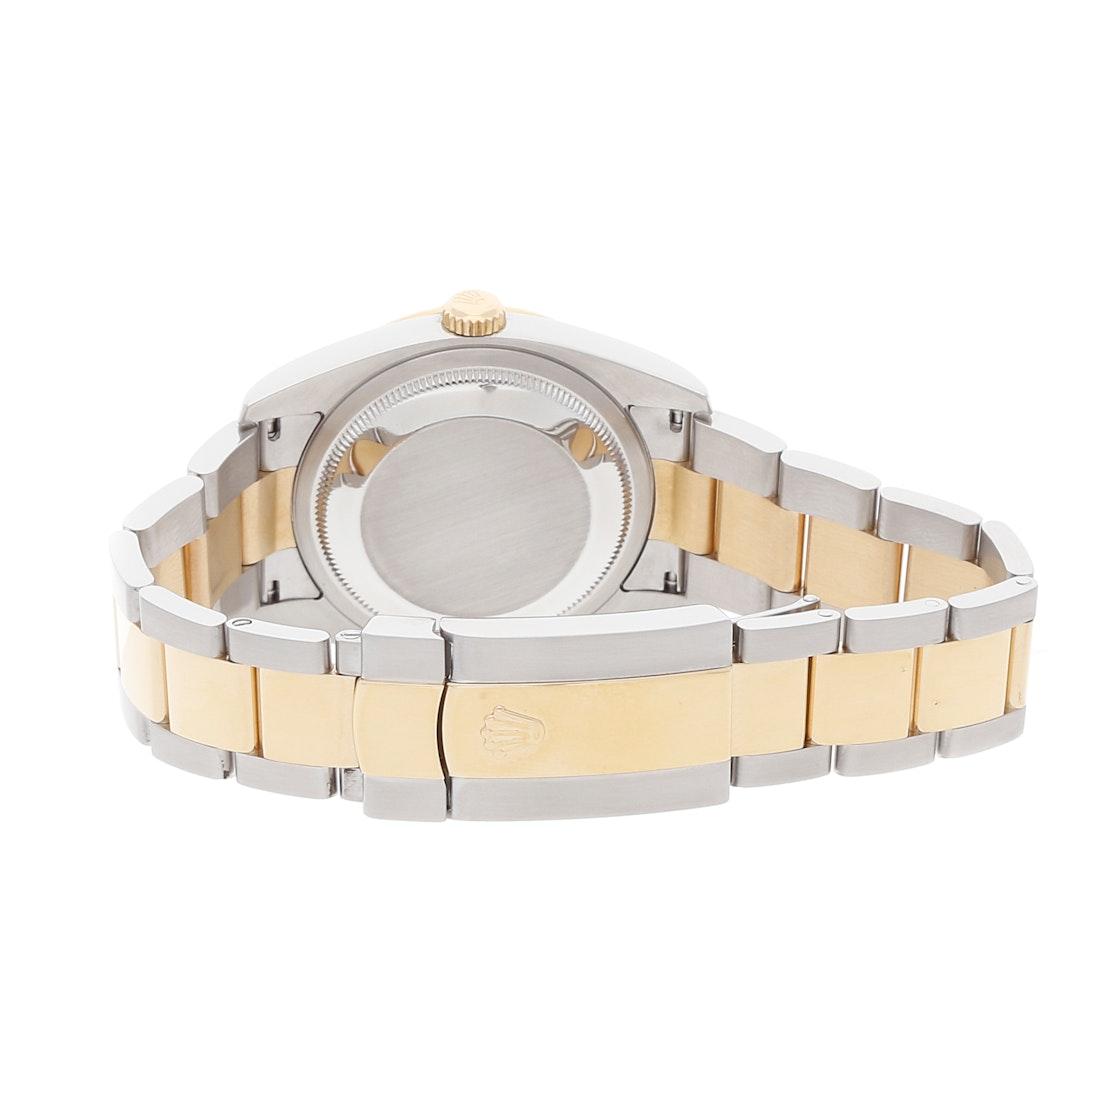 Rolex Datejust Turn-O-Graph 116263